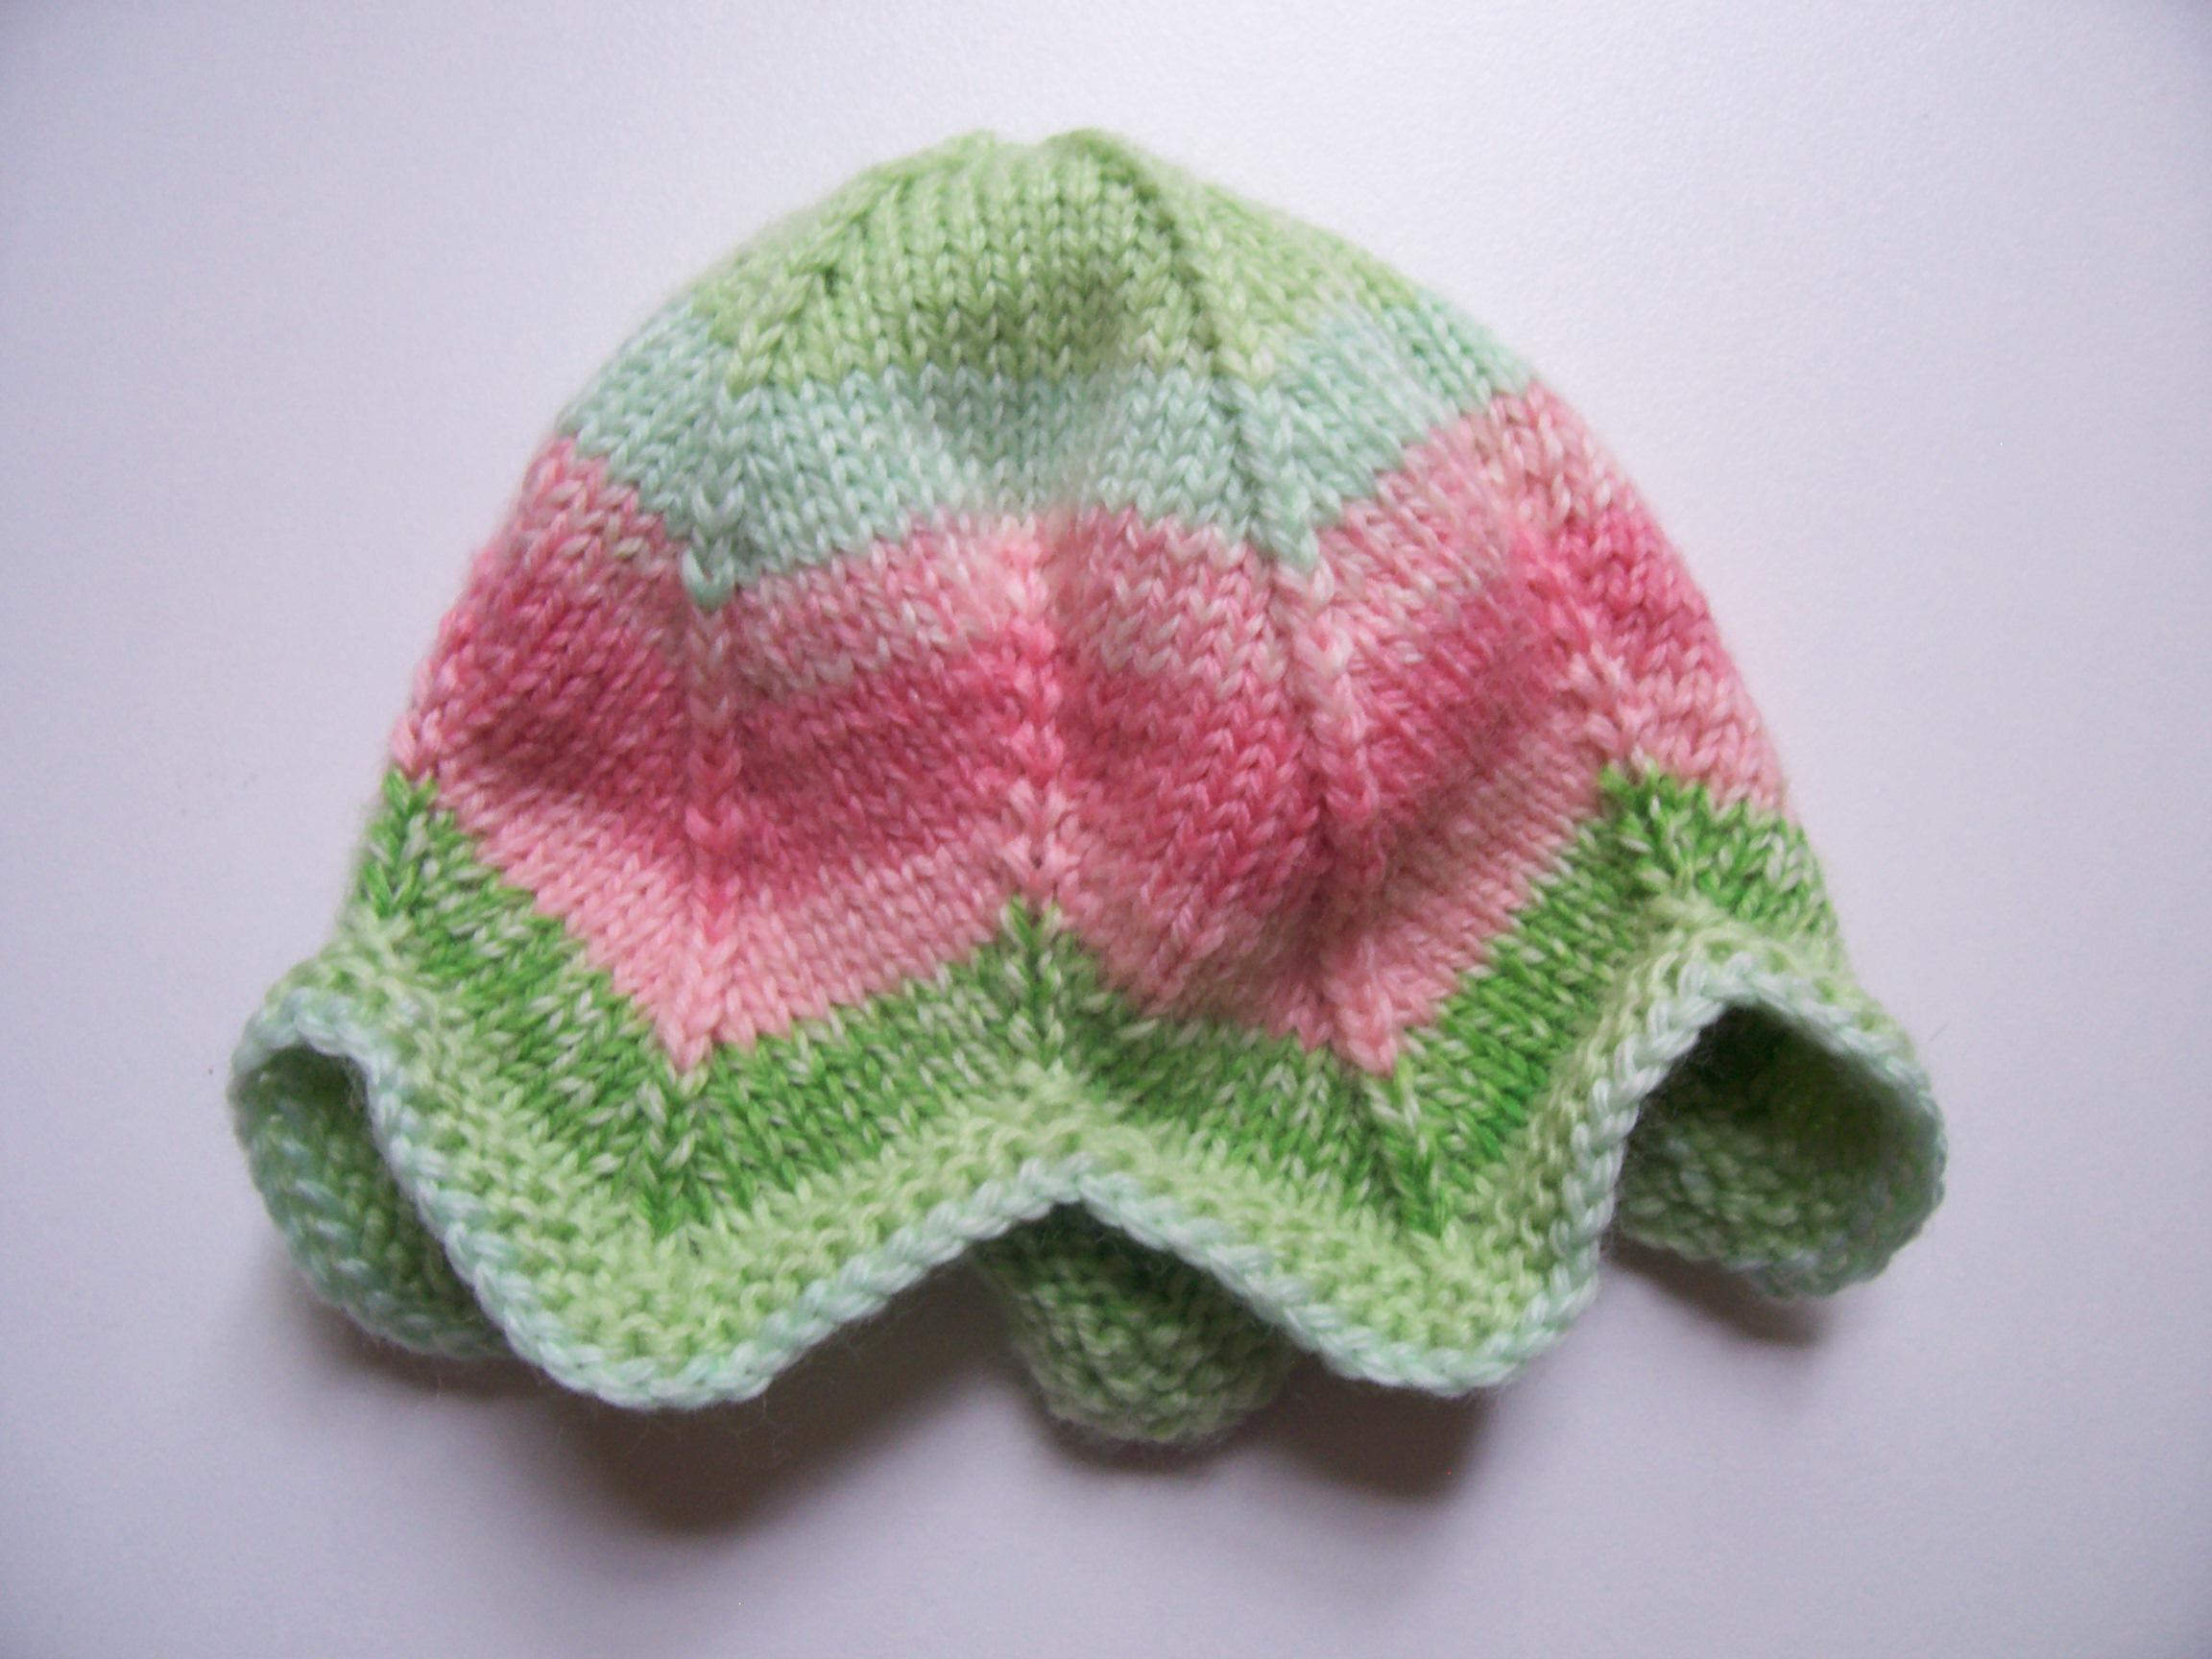 Free Knitting Patterns For Preemie Blankets : Tulip Preemie Hat a k n i t i c a